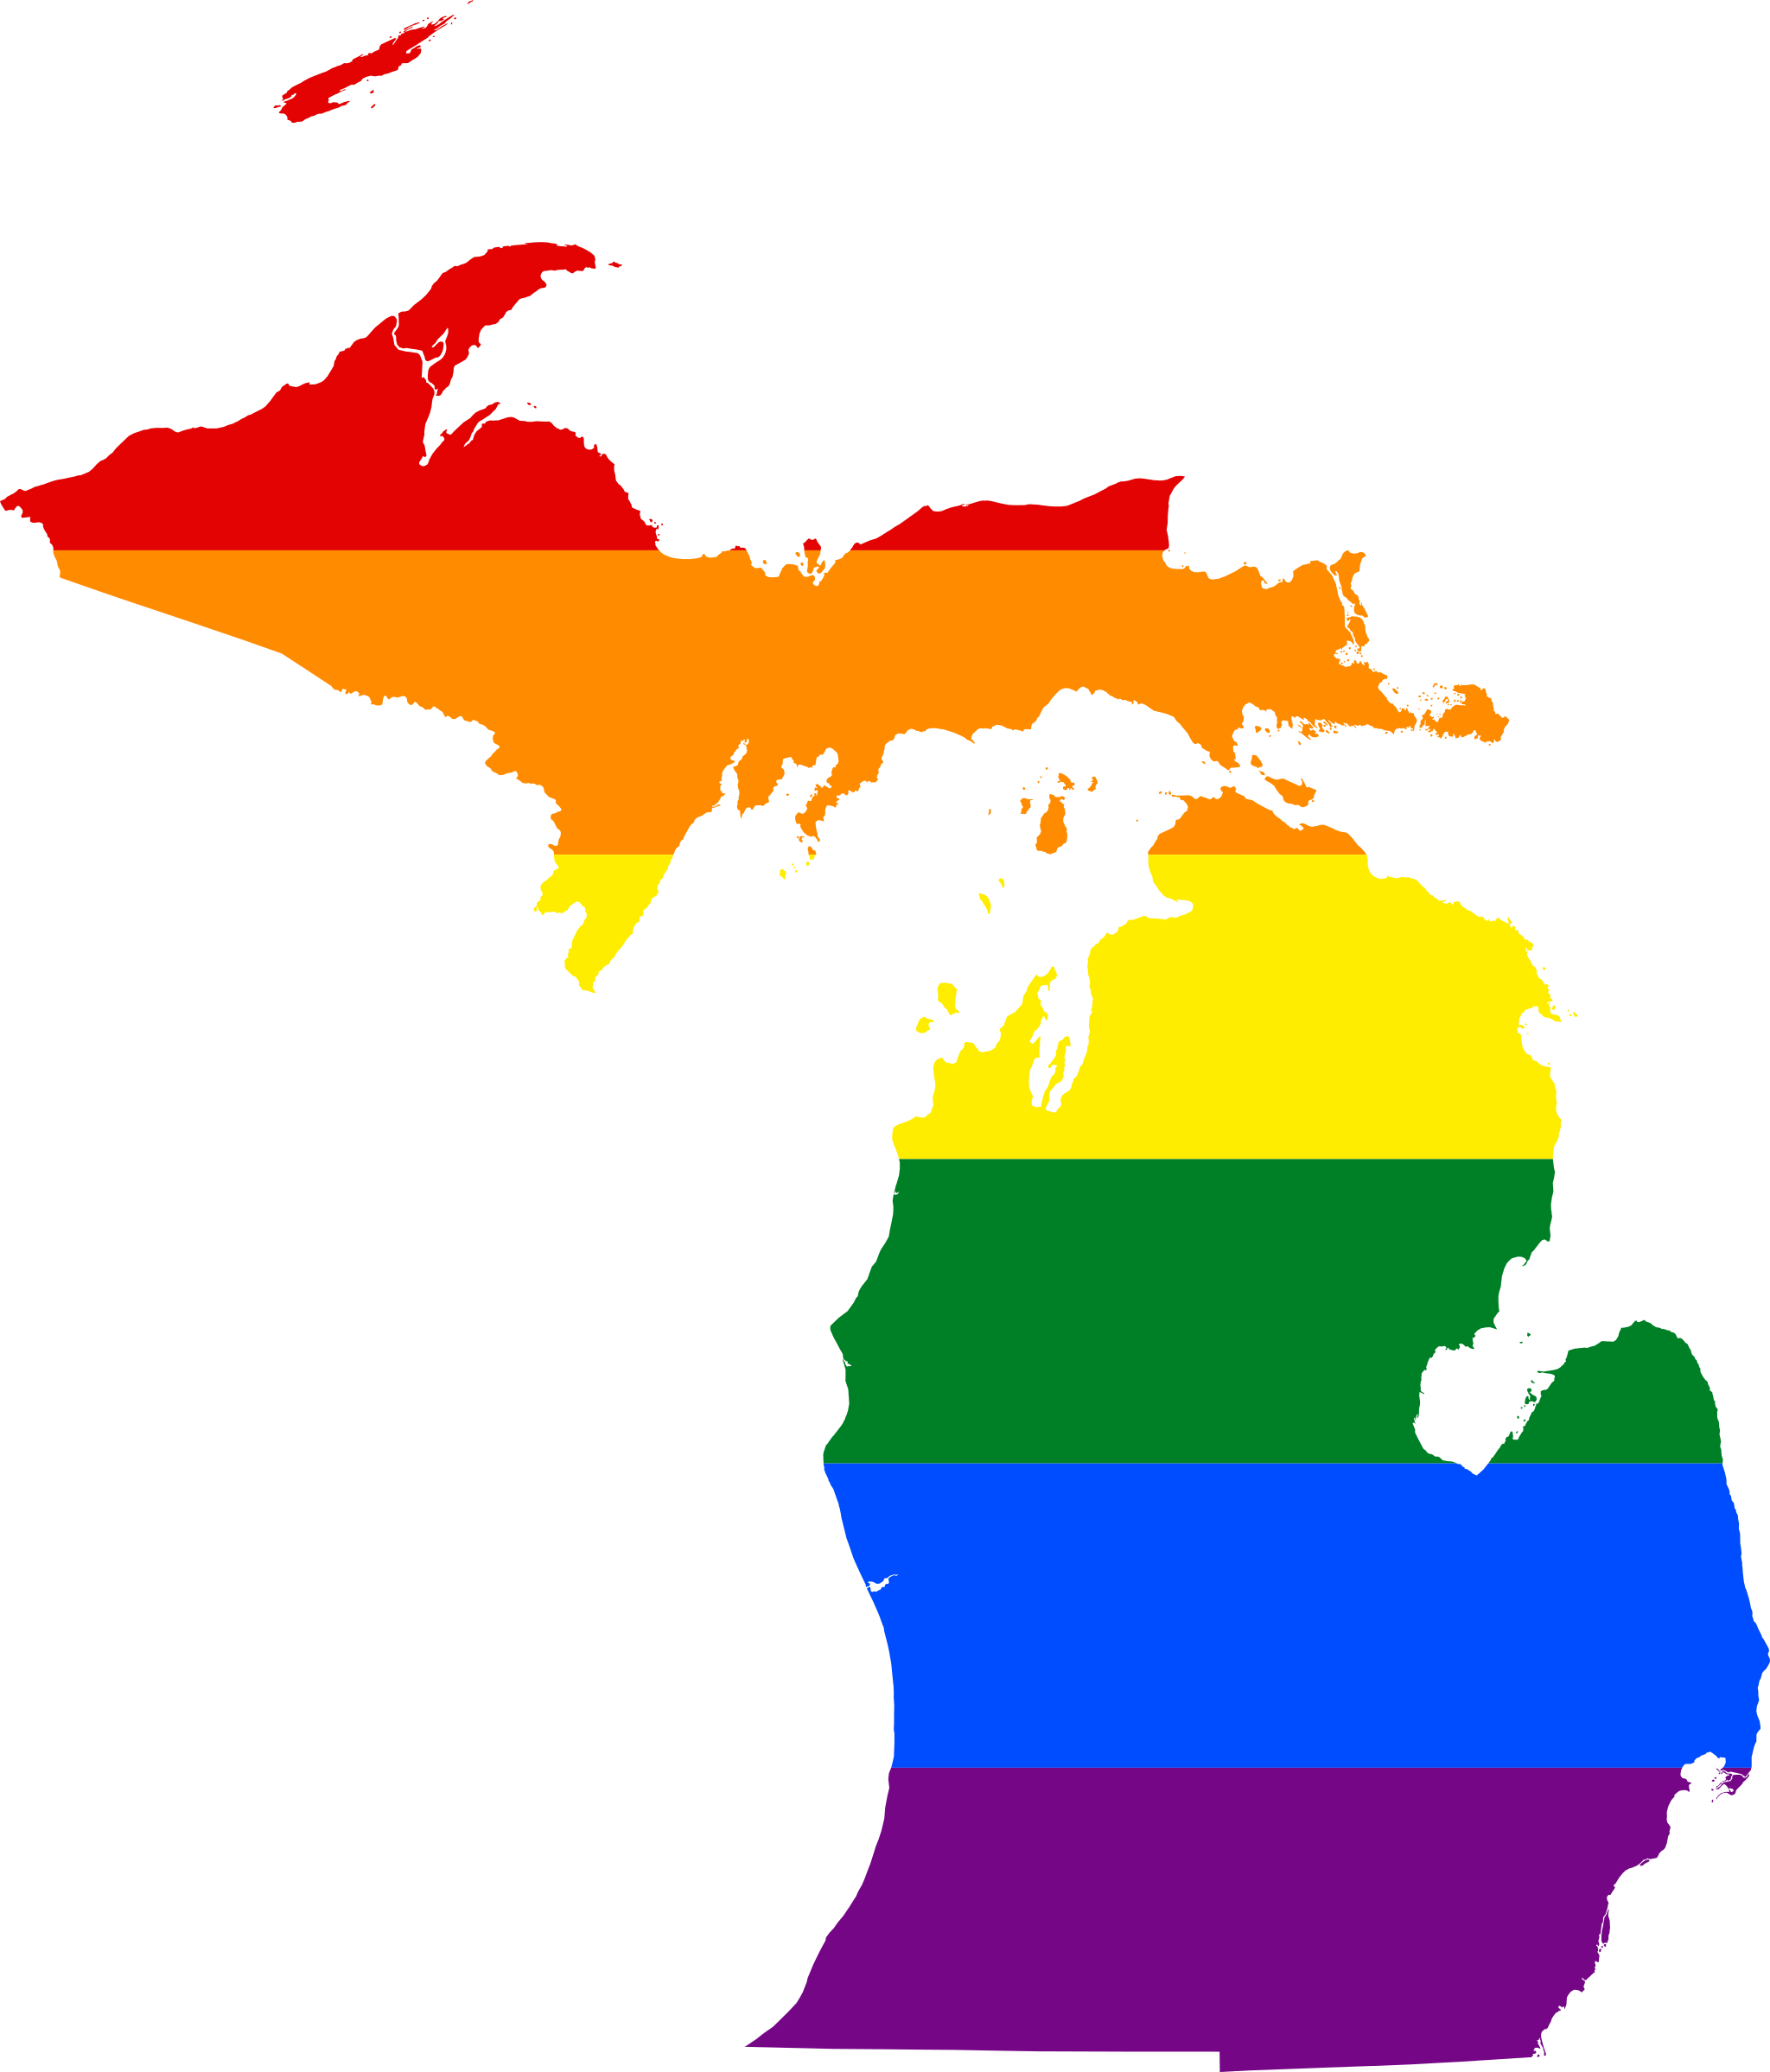 Michigan clipart mitten. Best photos of outline